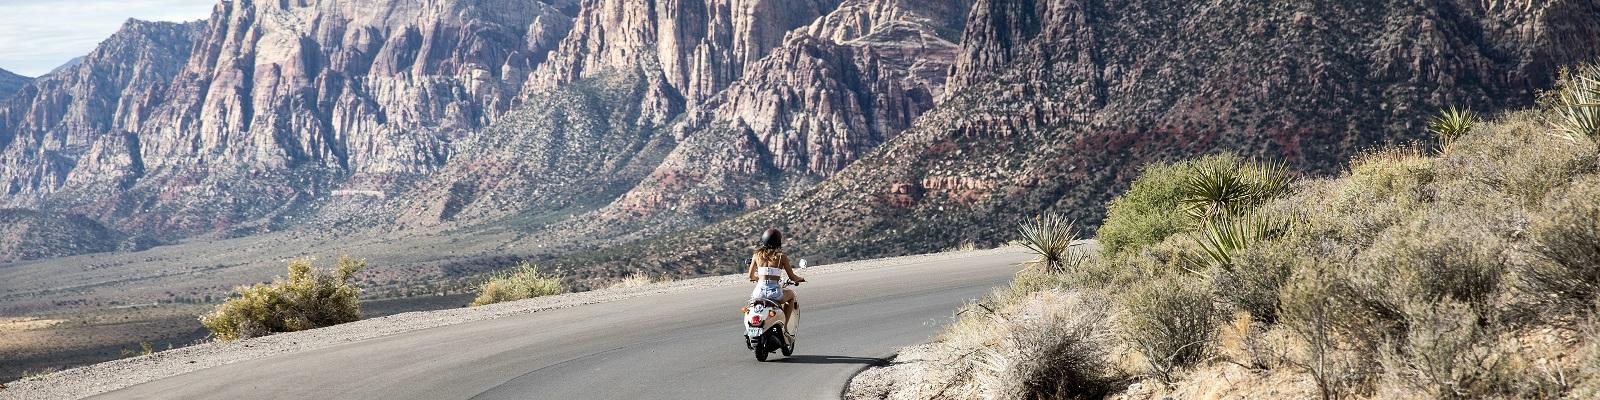 A person riding a scooter through Red Rock Canyon, Nevada